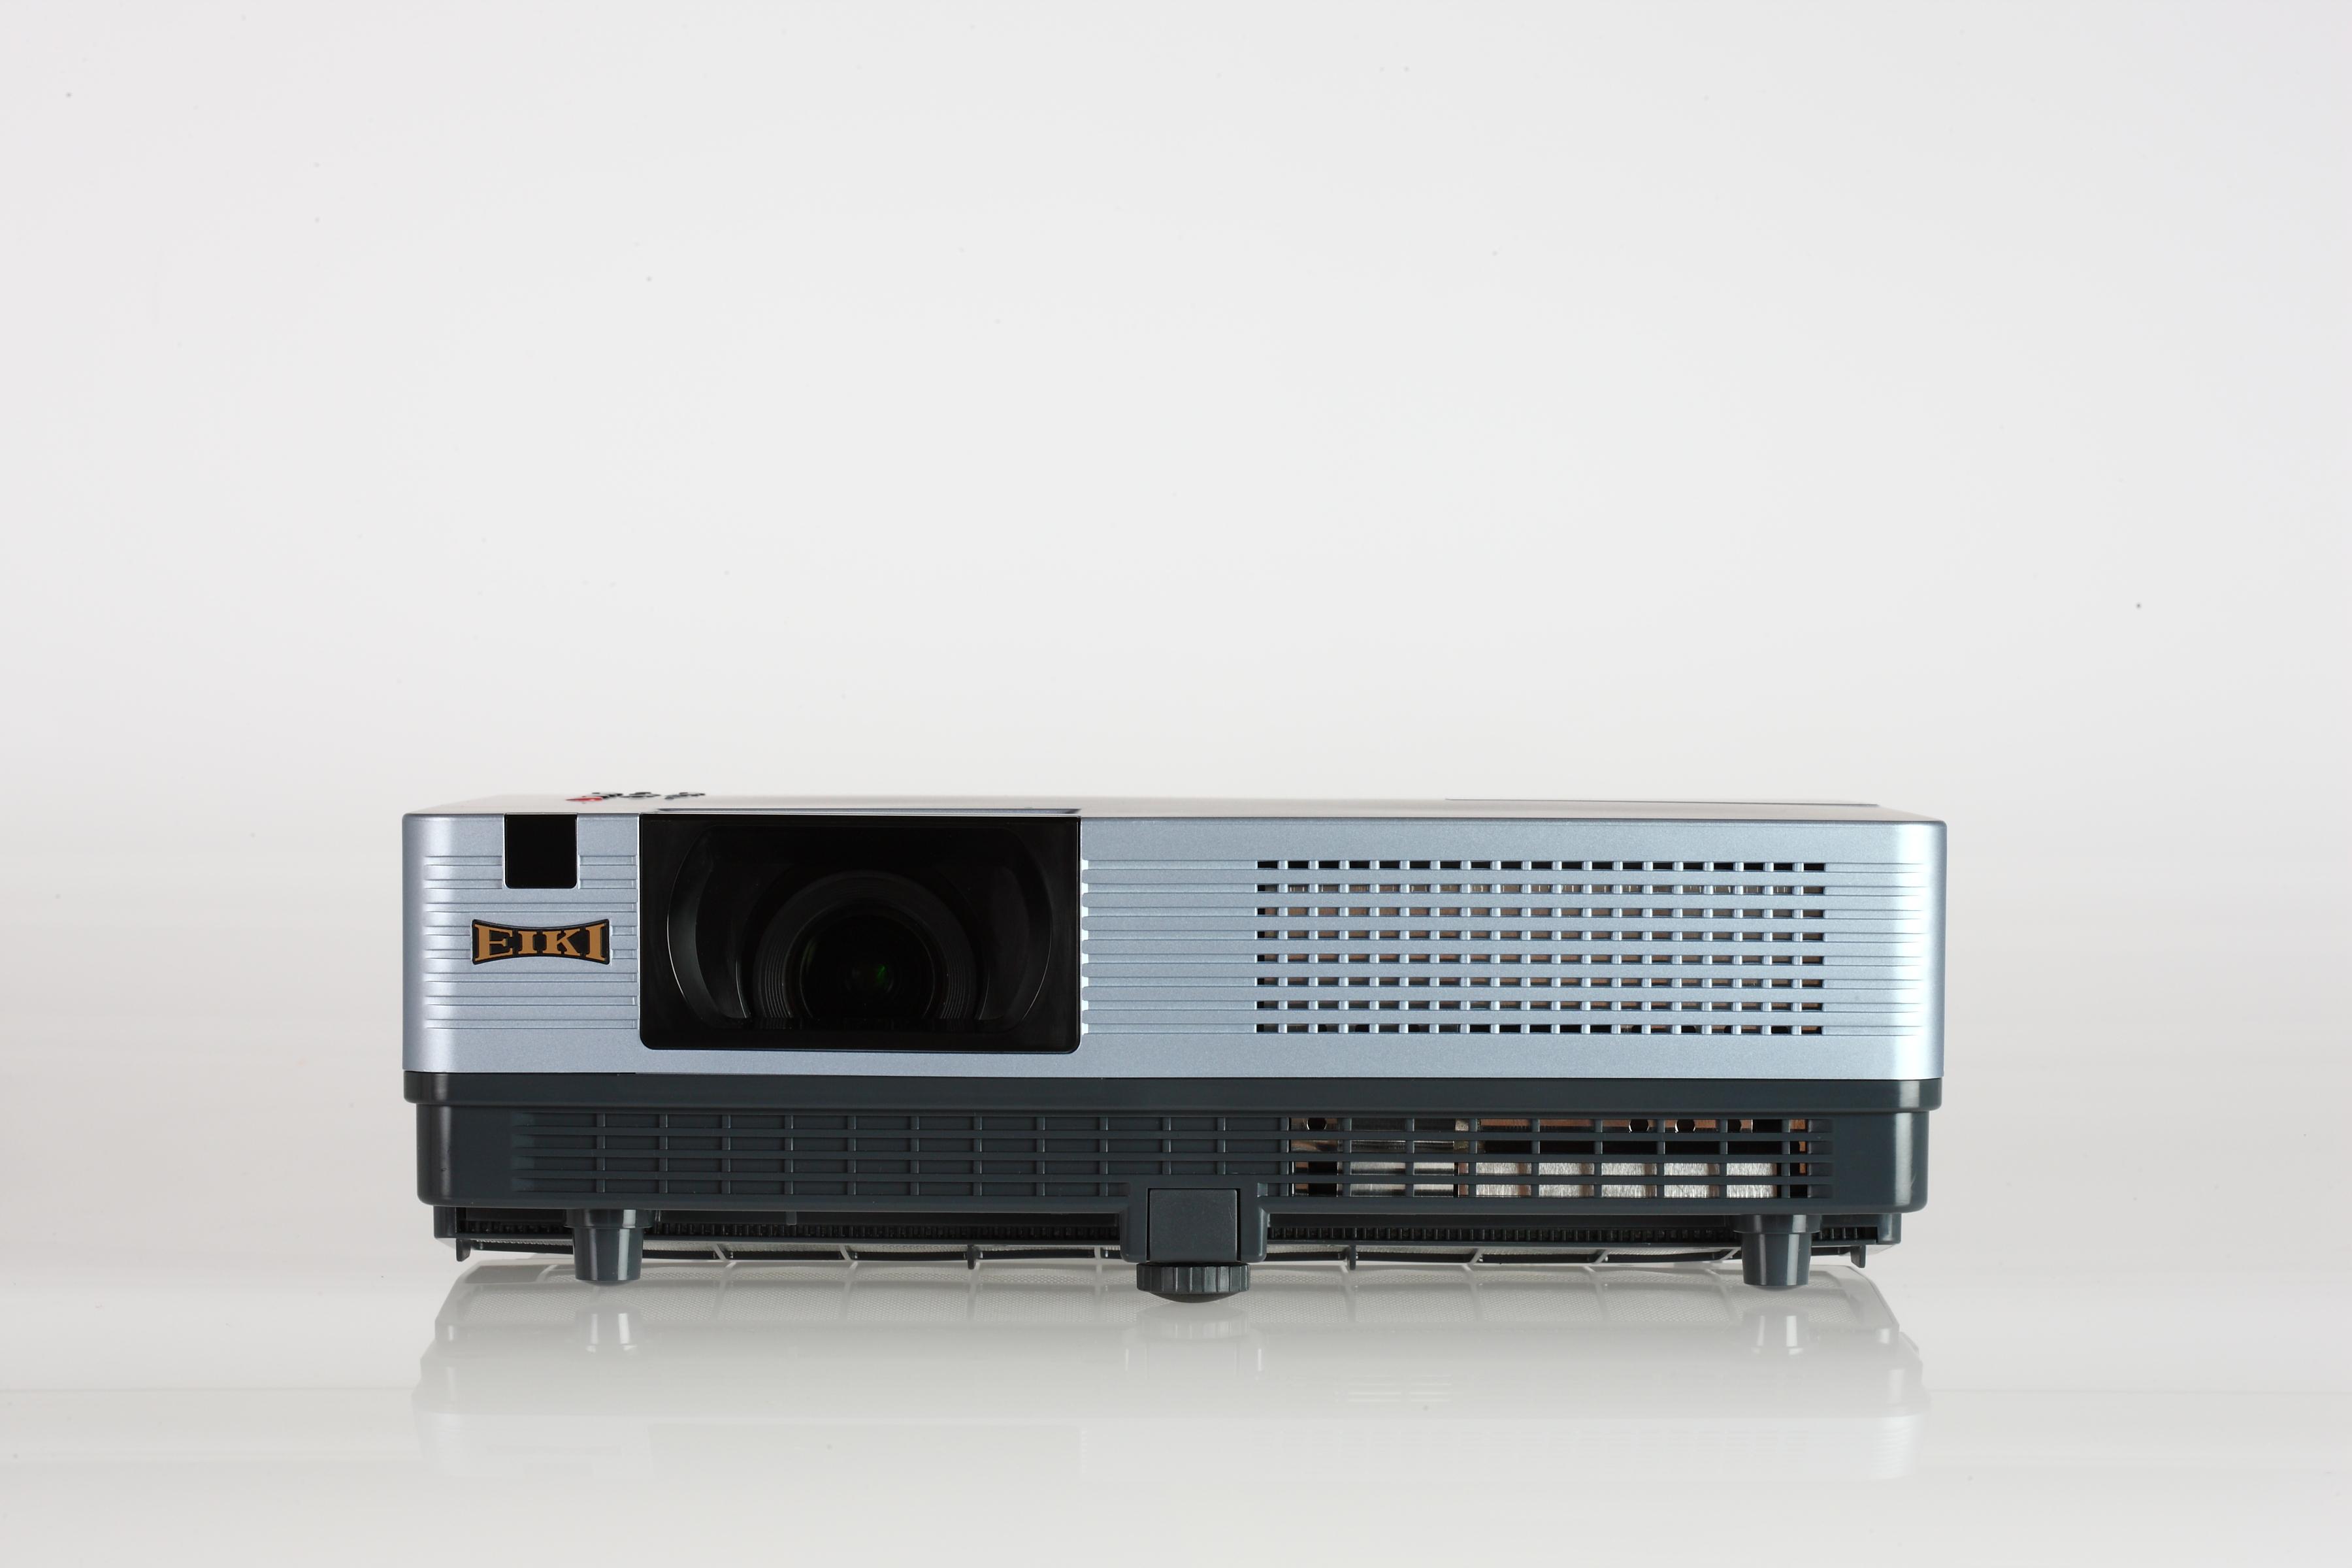 Eiki Projektoren Lc Xbm26 W Xga Lcd Beamer Hitachi Projector Cp Ex302 Projektor